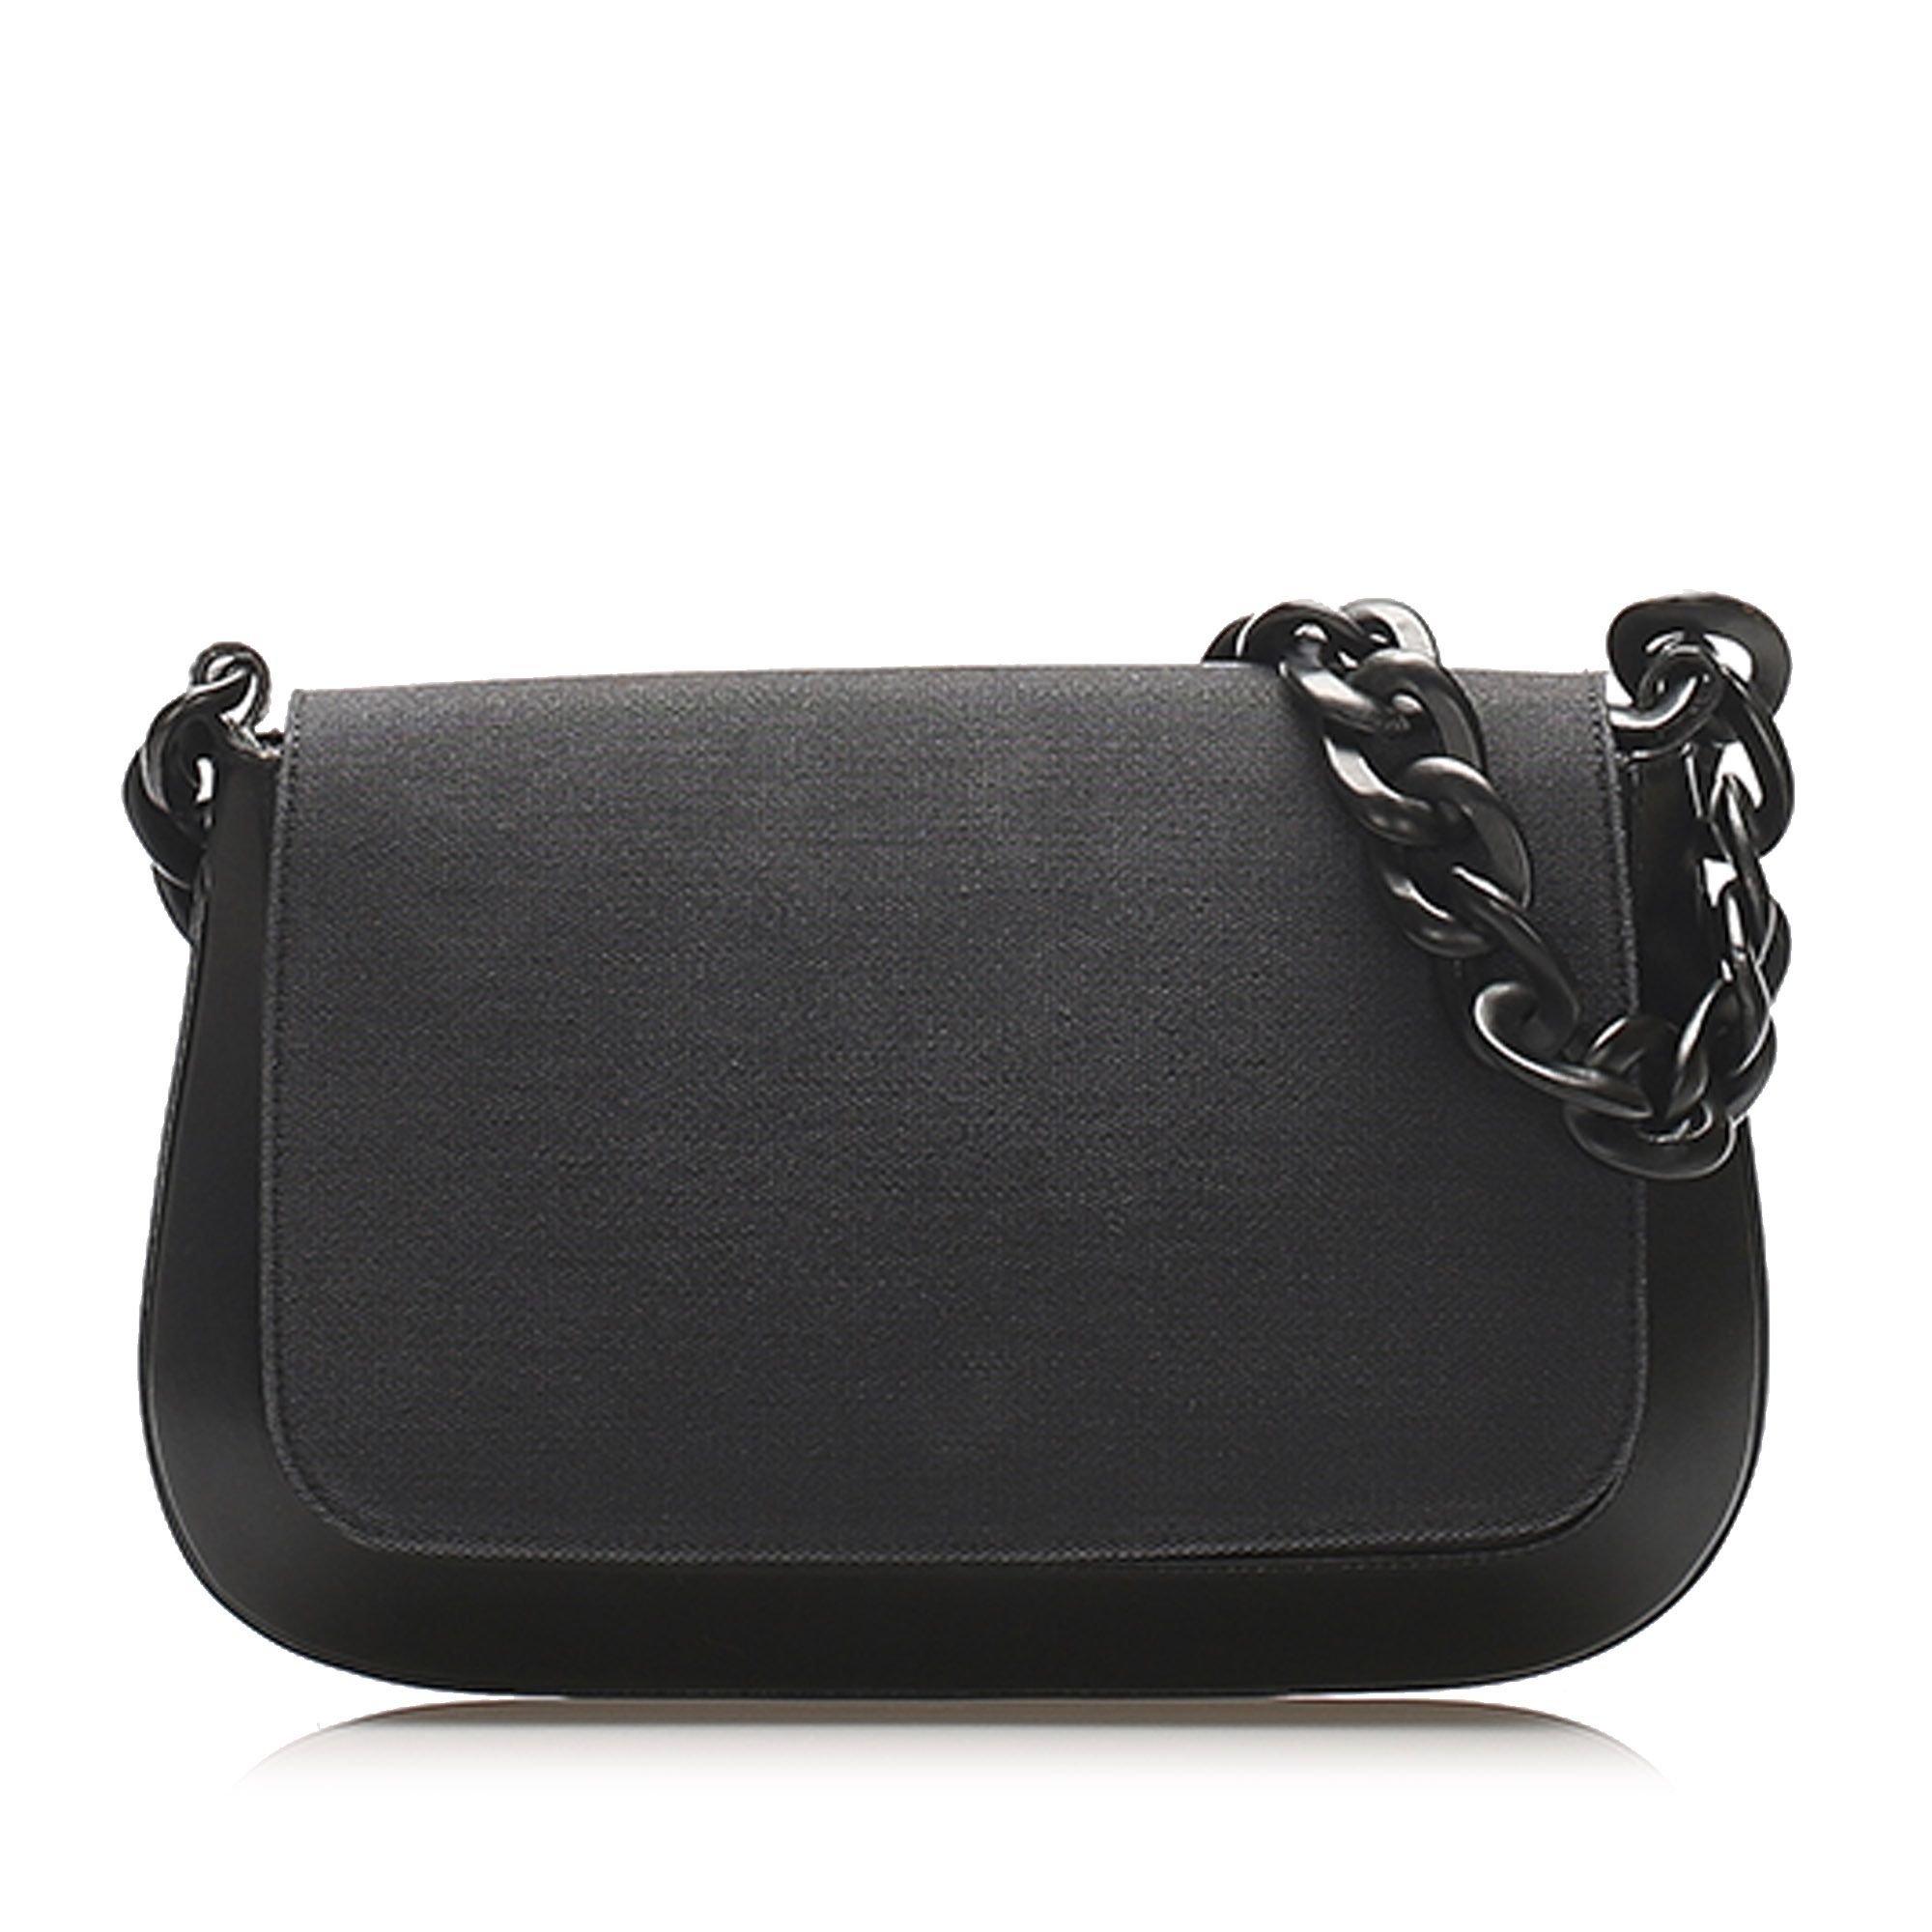 Vintage Gucci Canvas Chain Shoulder Bag Black